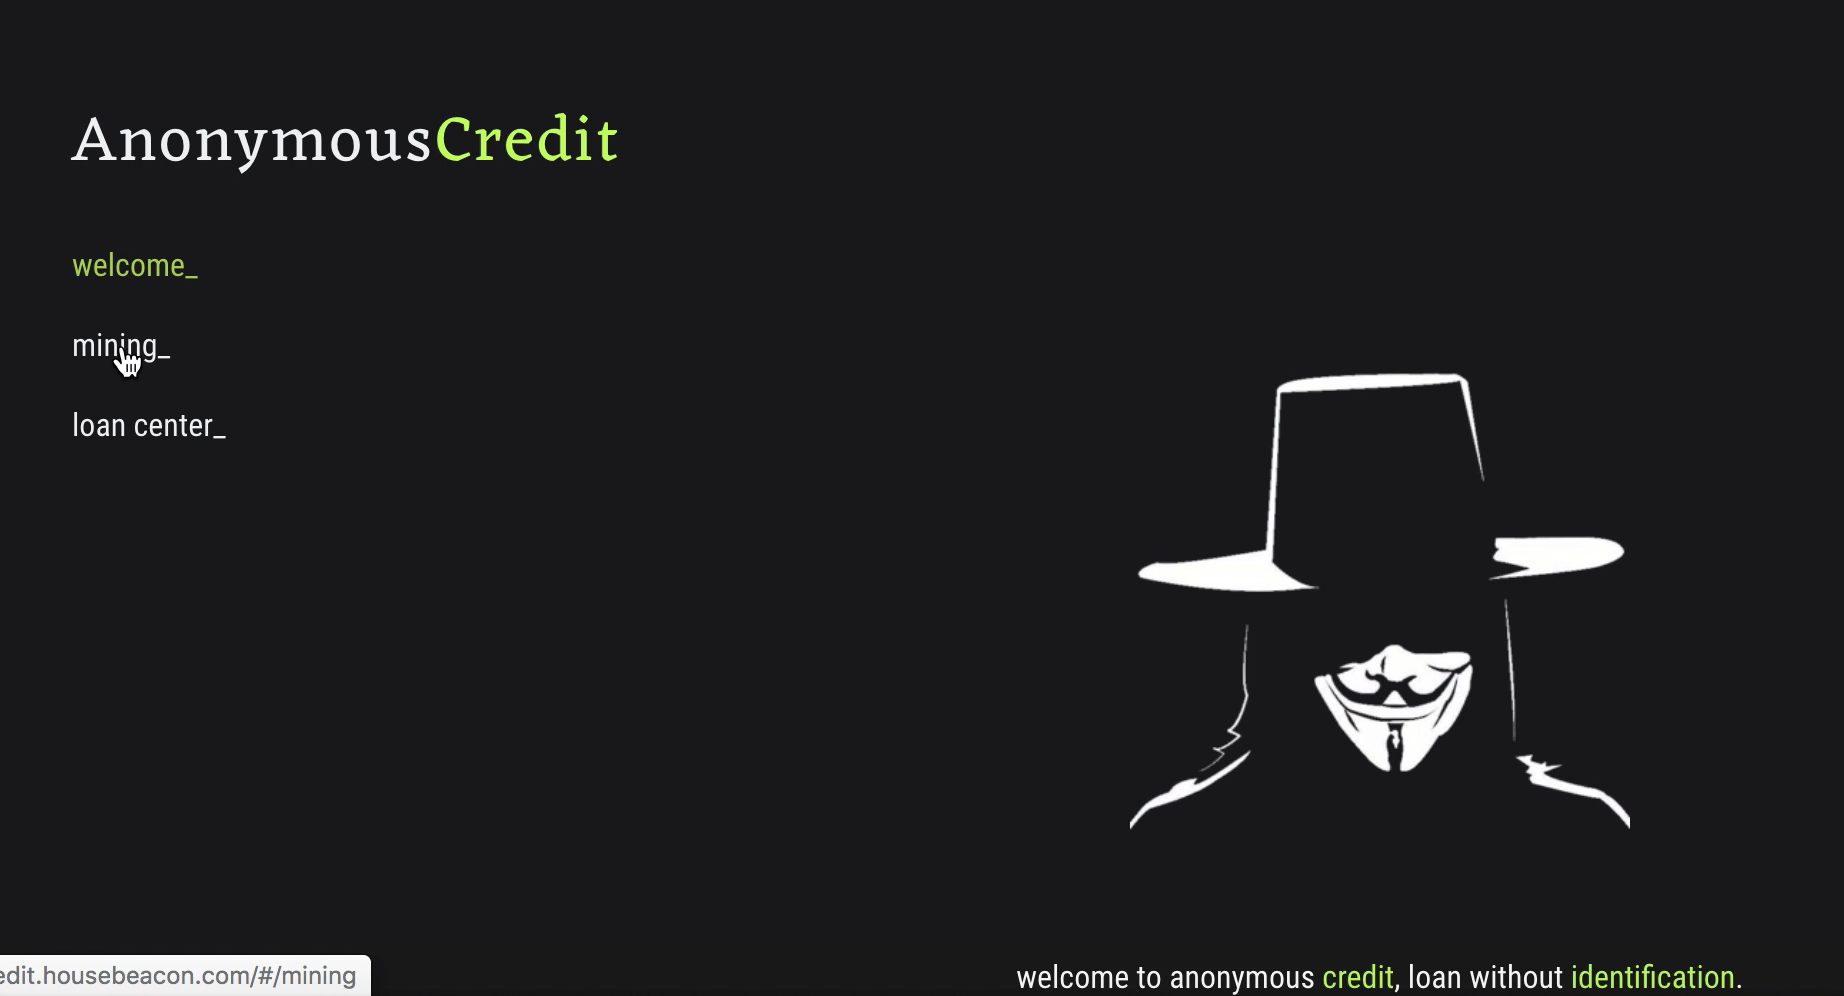 Anonymous Credit showcase